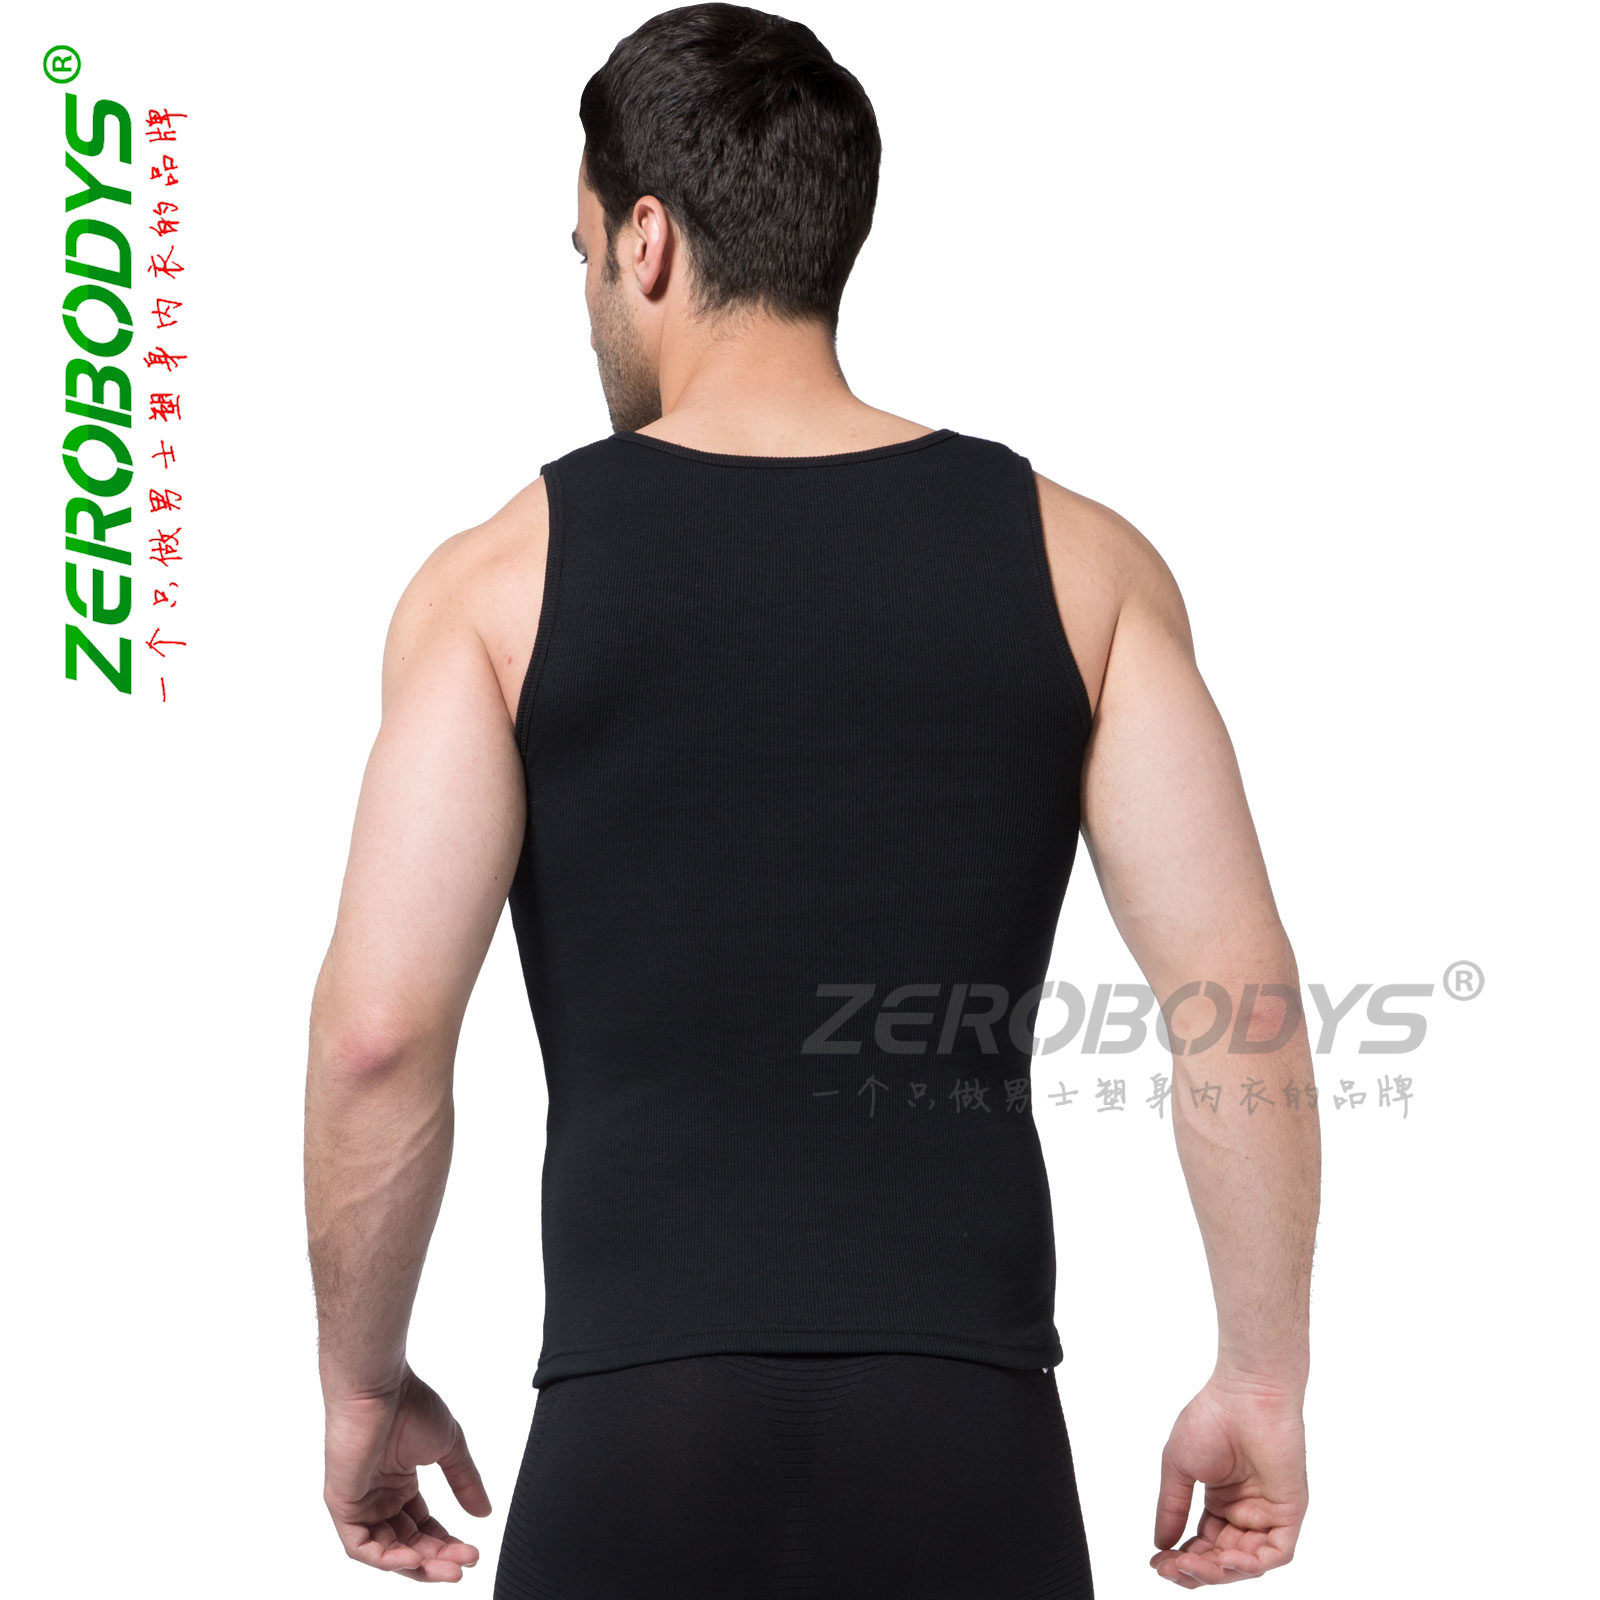 Корректирующая одежда ZeroBodys 298